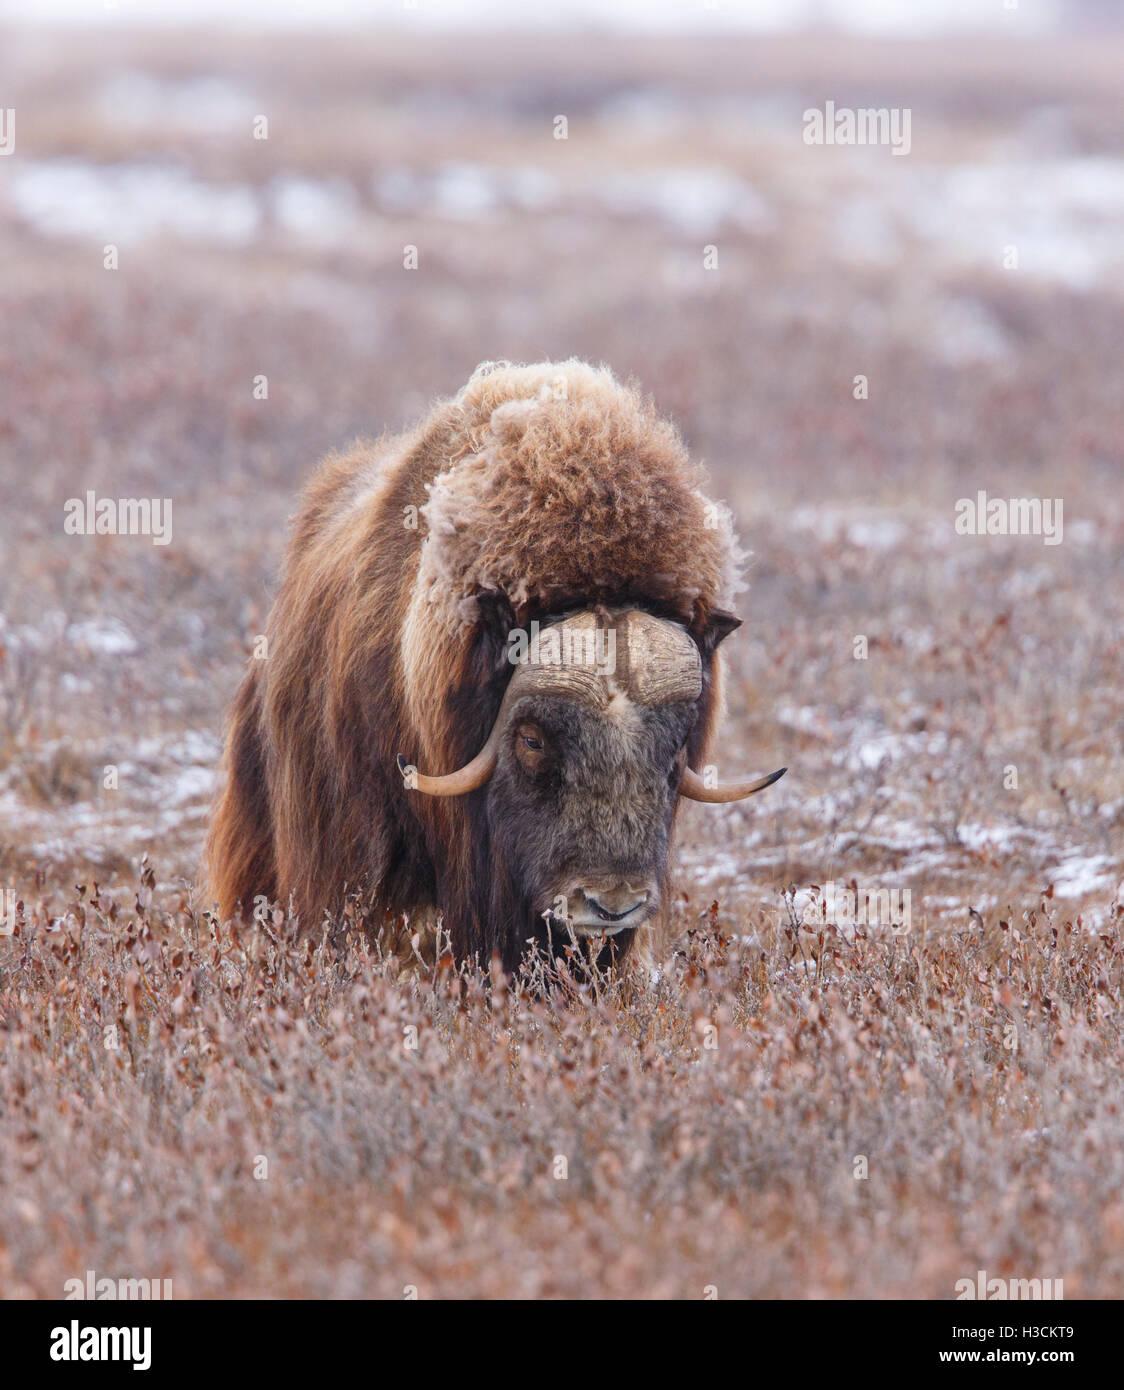 Muskox near the Dalton Highway, Alaska. - Stock Image